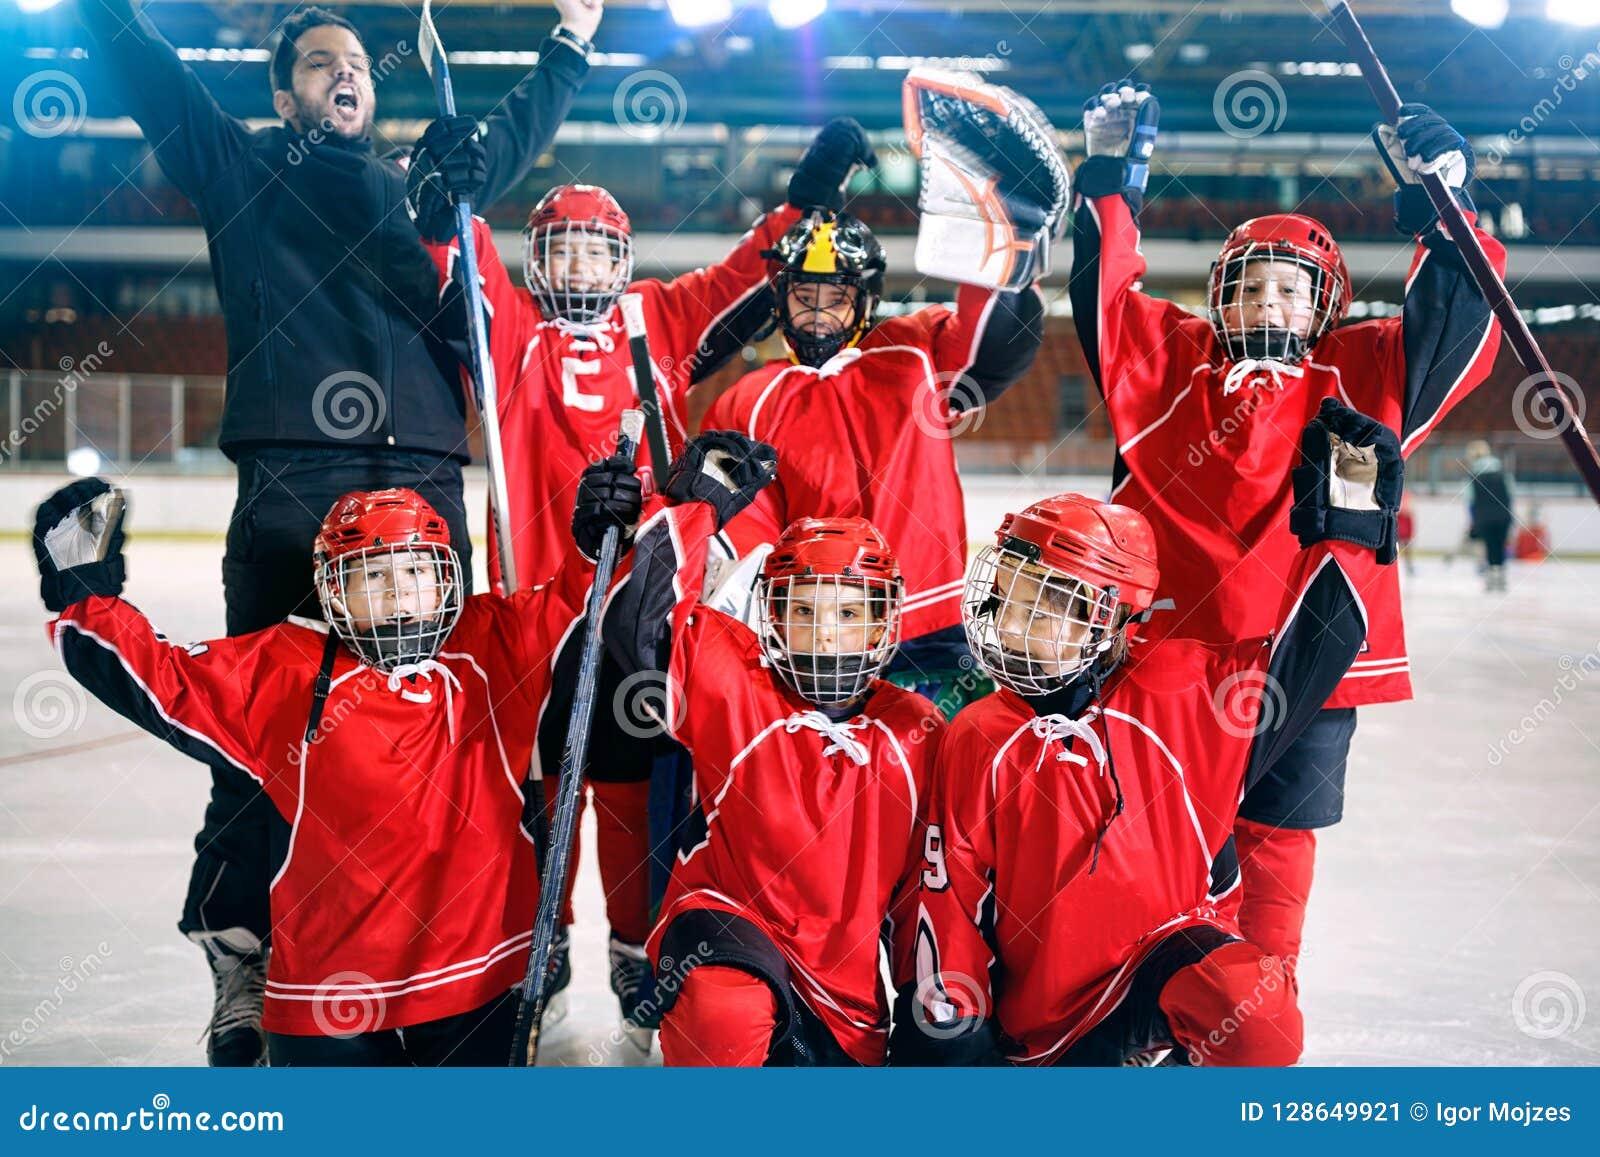 Portrait of happy boys players team ice hockey